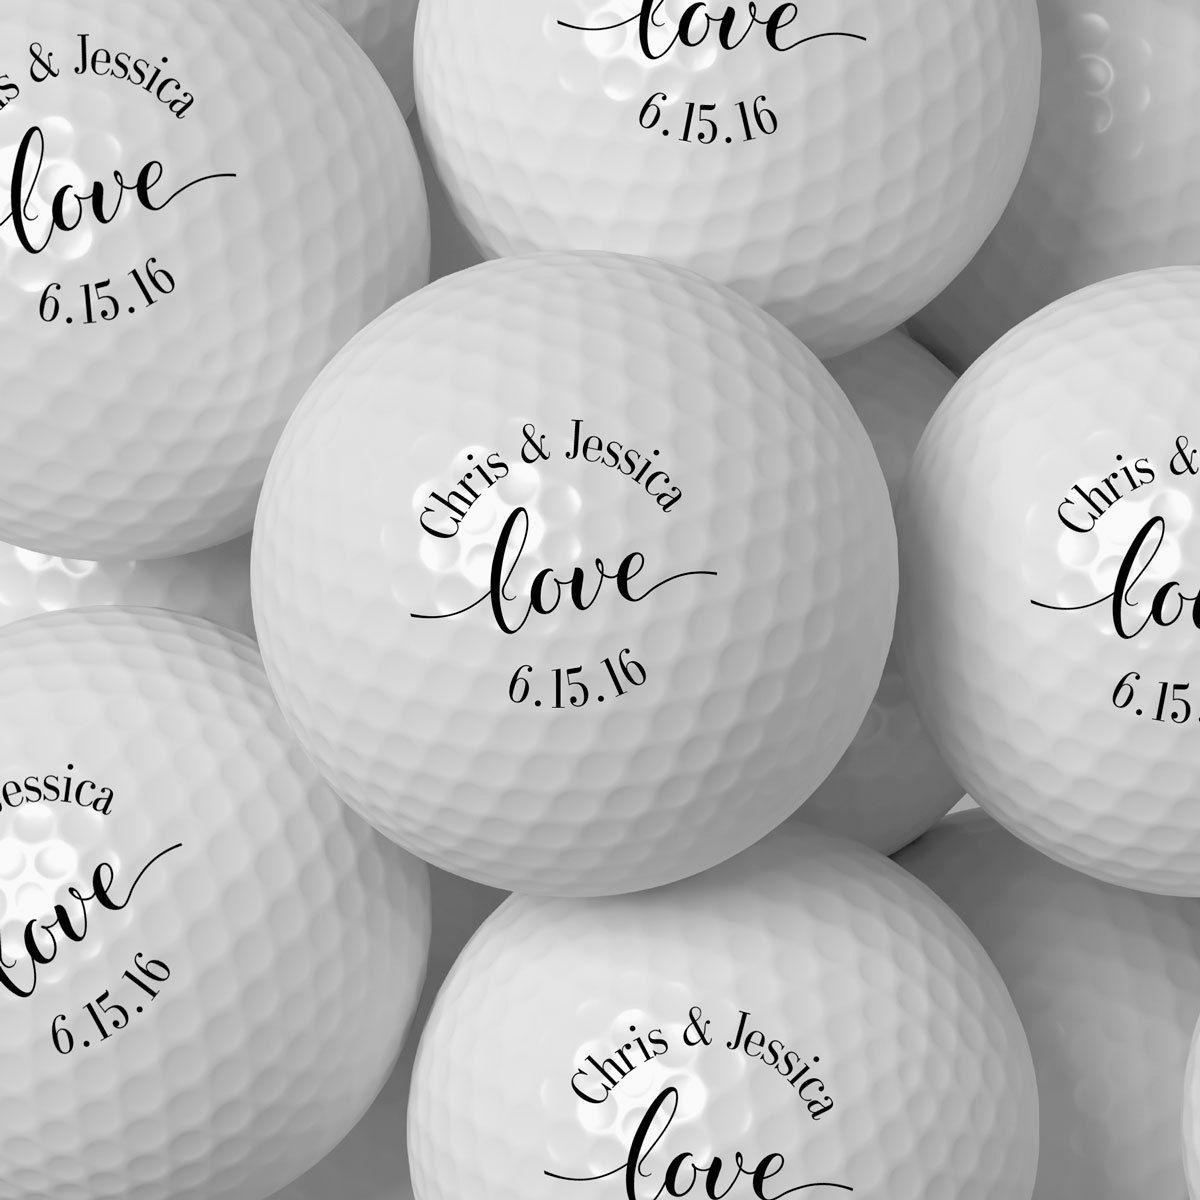 Love Personalized Golf Balls #bridalshower #customfavor #favor ...